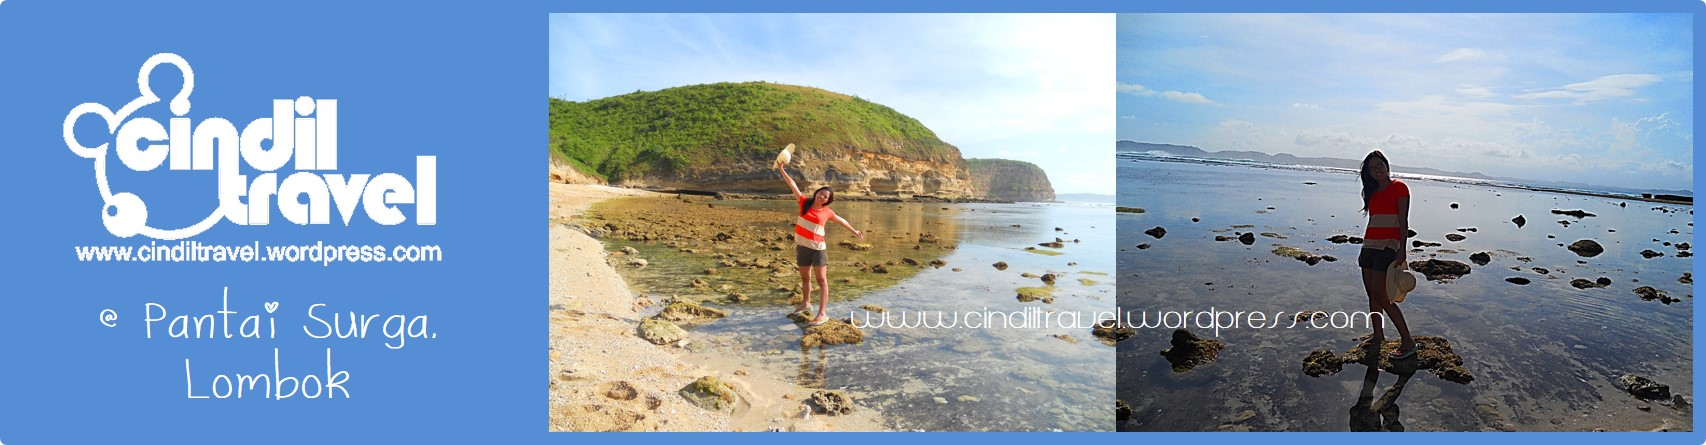 Pantai Surga cindiltravel 1